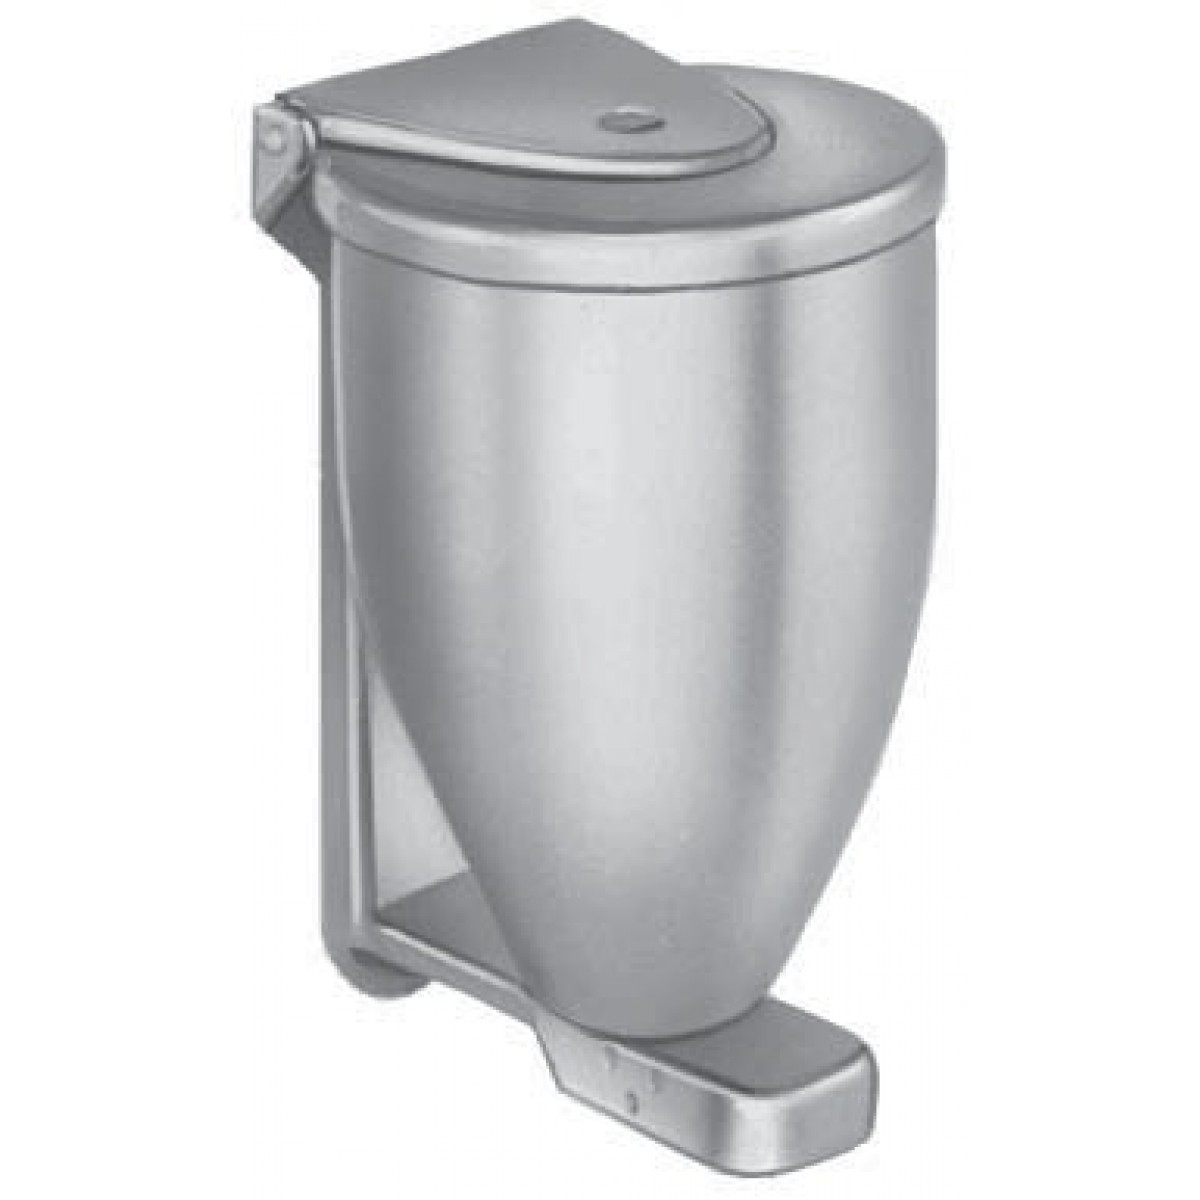 Bradley 658-30 Powdered Soap Dispenser (32 oz. cap.)